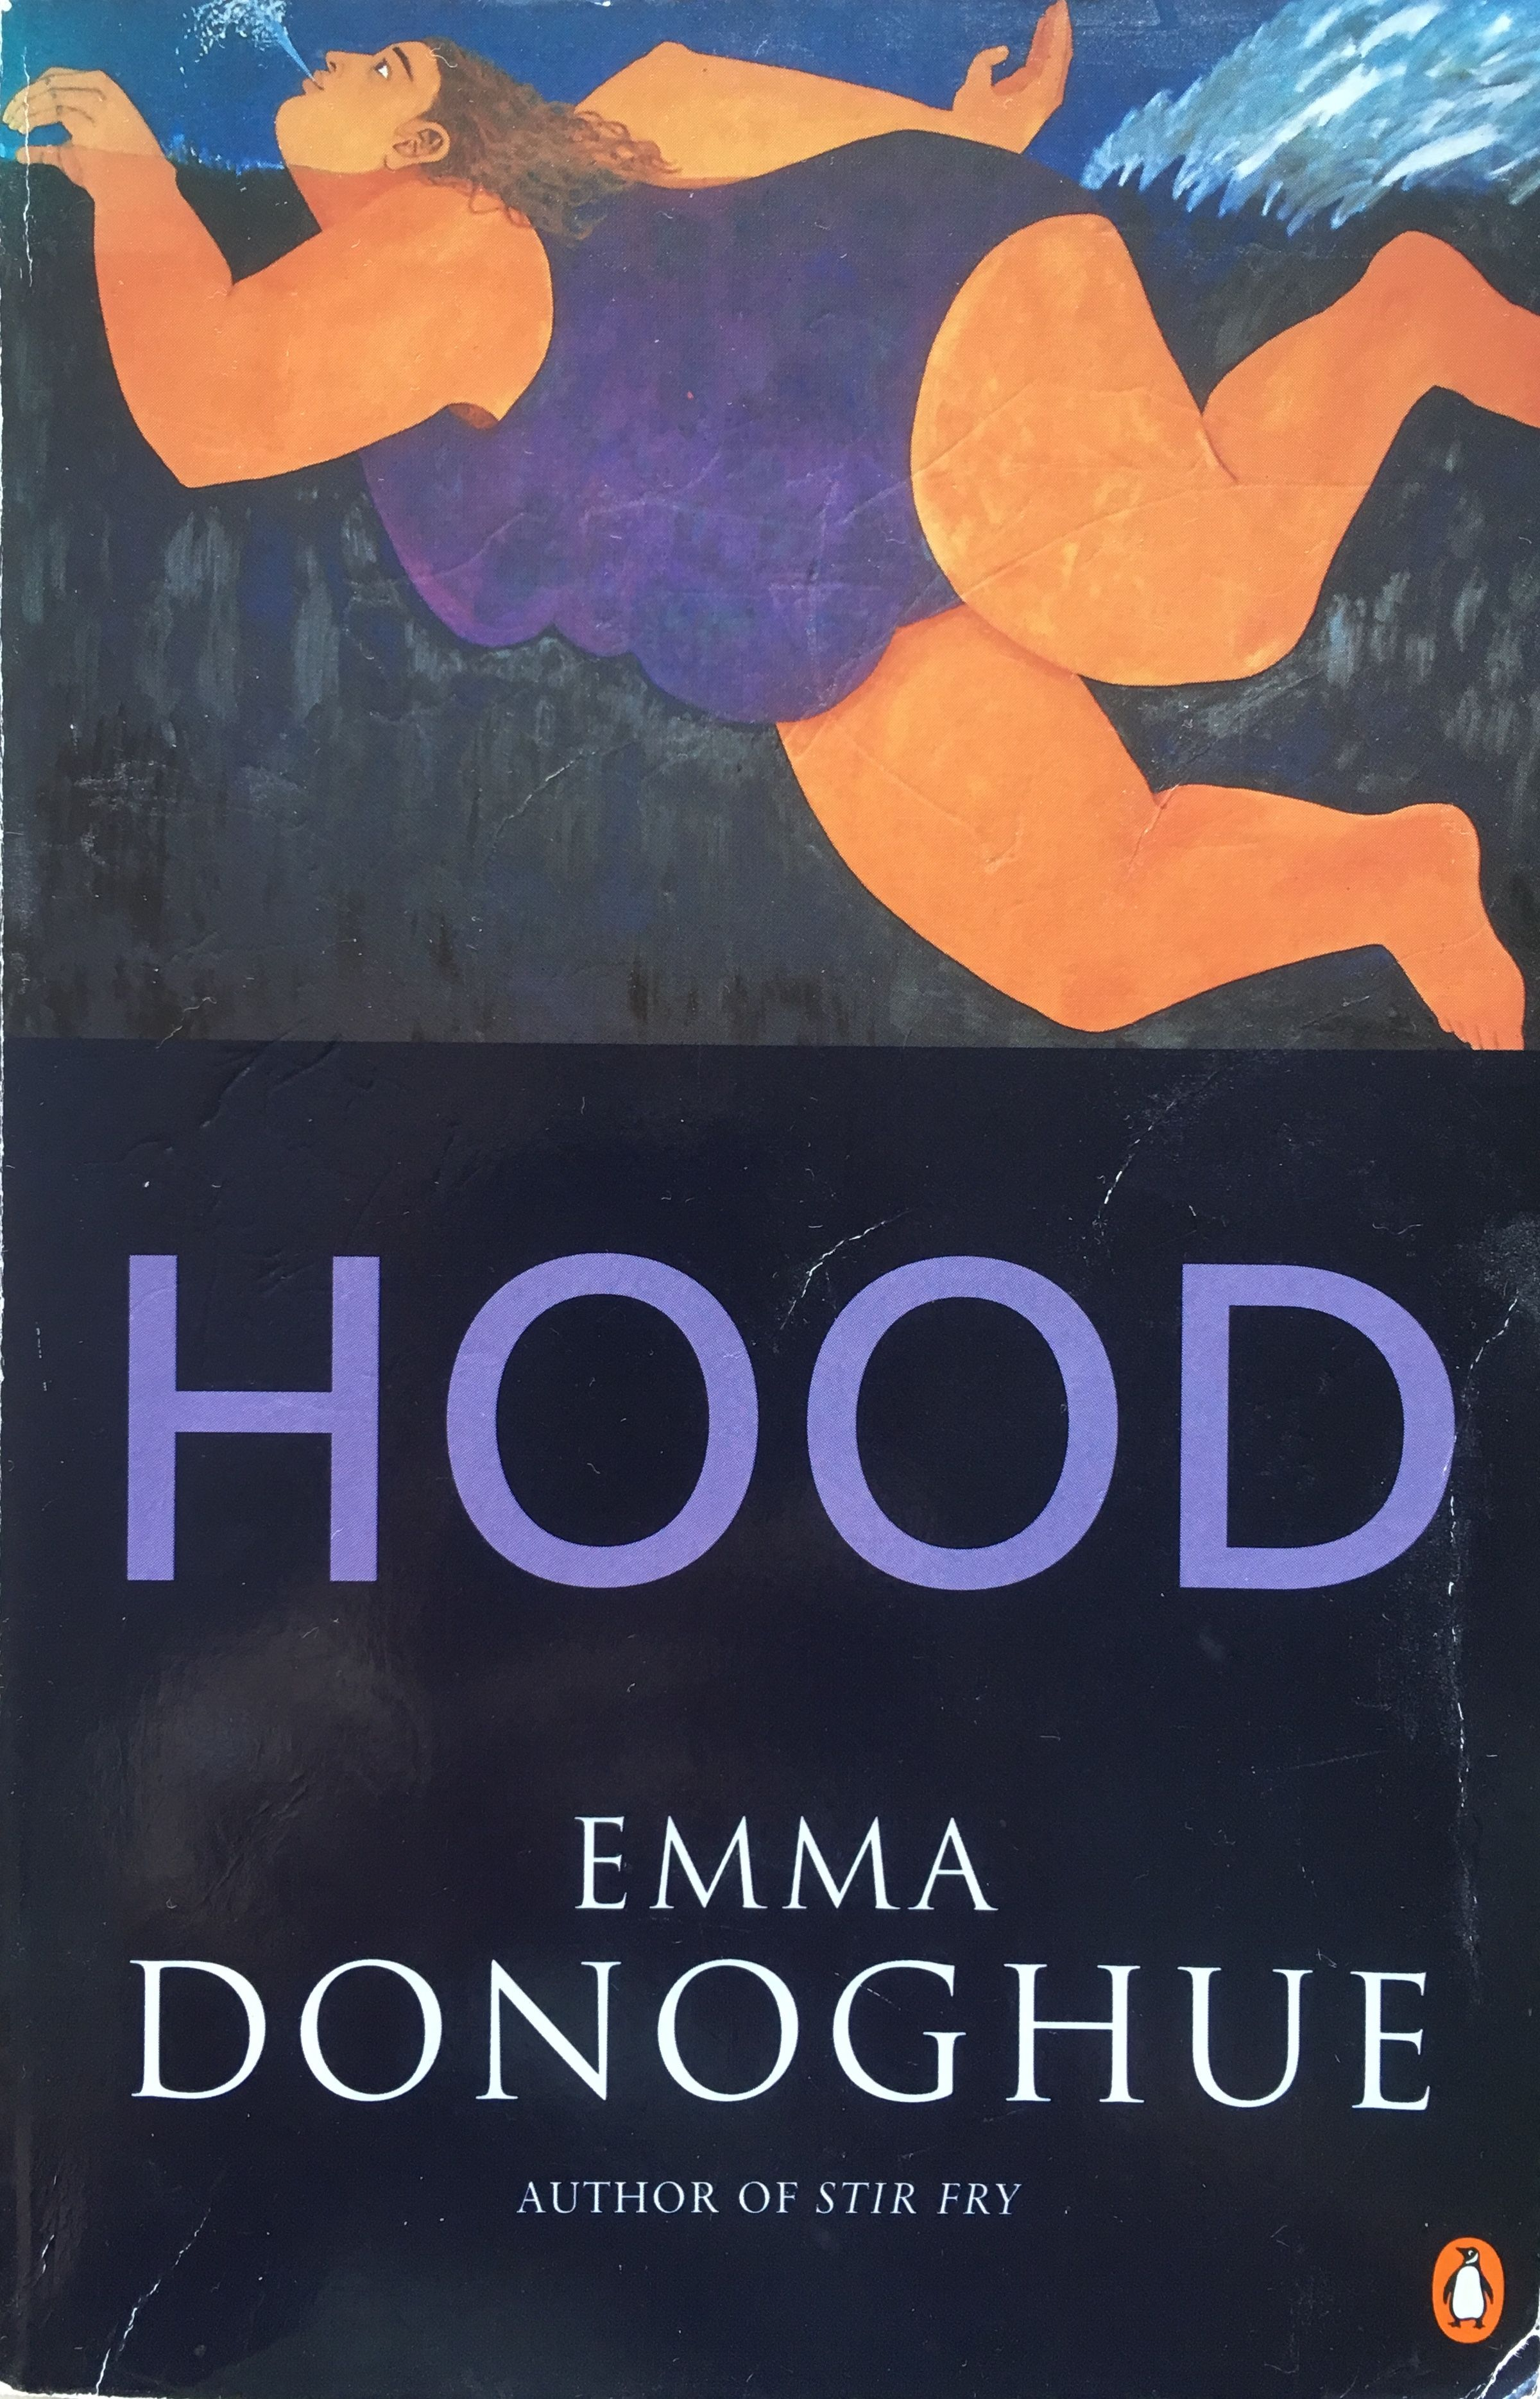 Emma donoghue hood 1993 emma donoghue literary